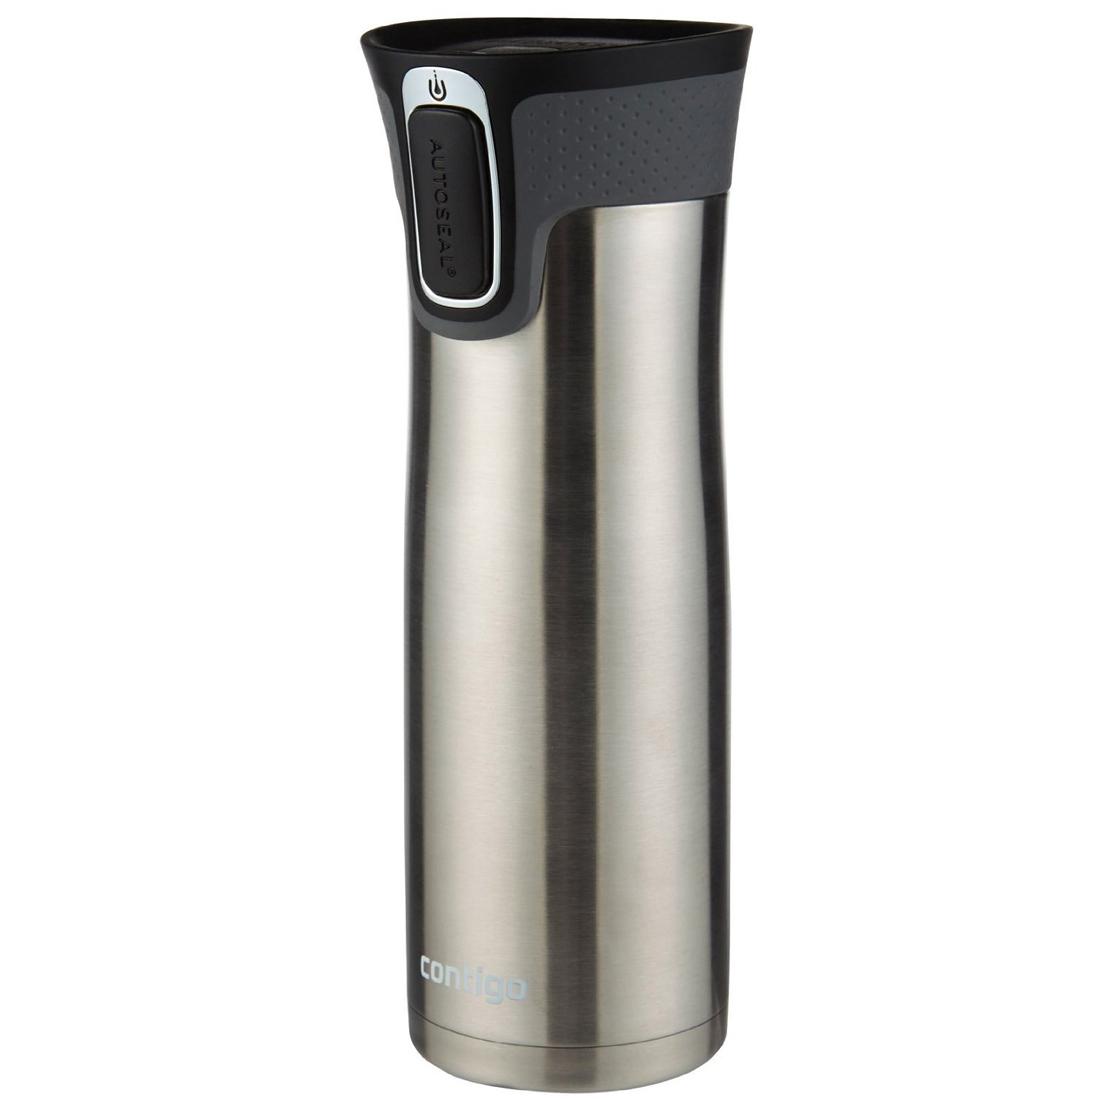 thumbnail 38 - Contigo 20 oz. West Loop 2.0 AutoSeal Insulated Stainless Steel Travel Mug